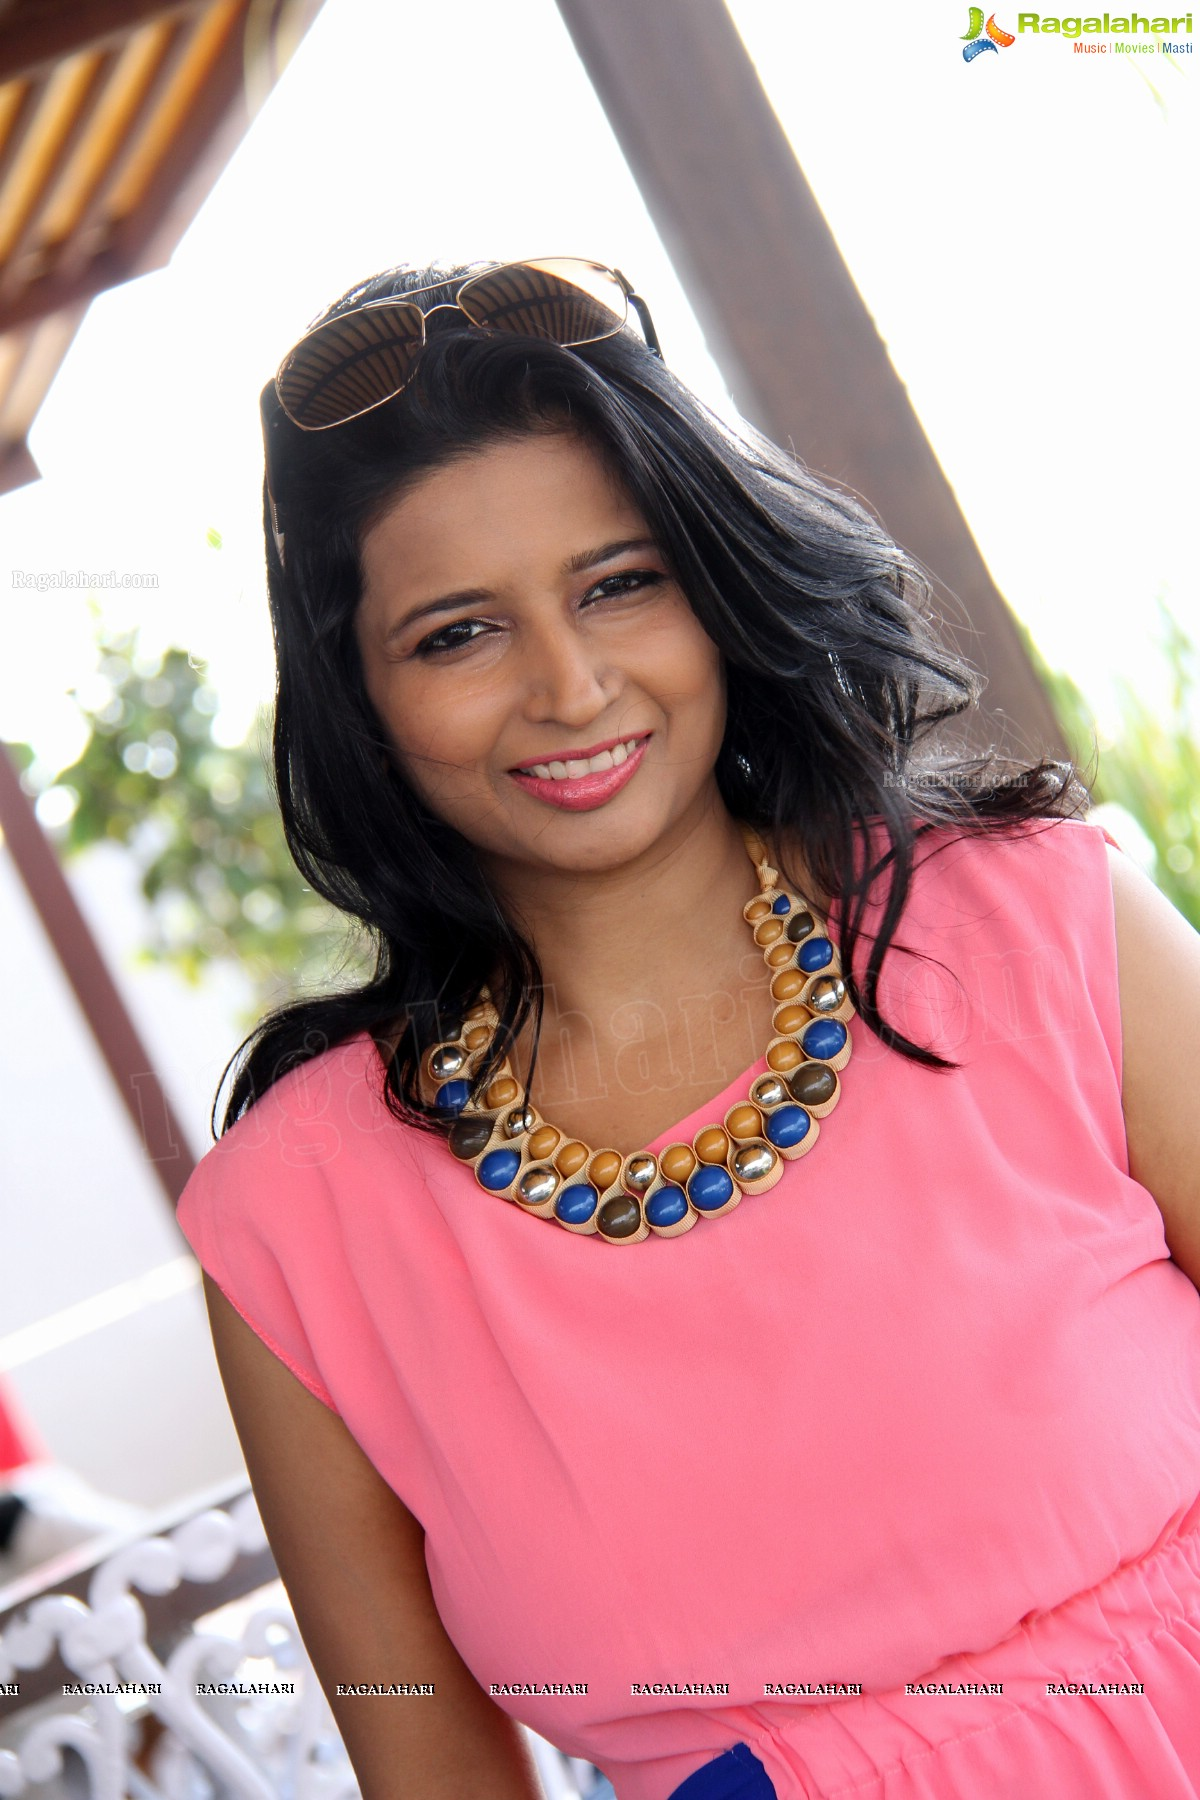 Sarita lohiya 39 s beauty with brains event hyderabad - Miton cucine forum ...